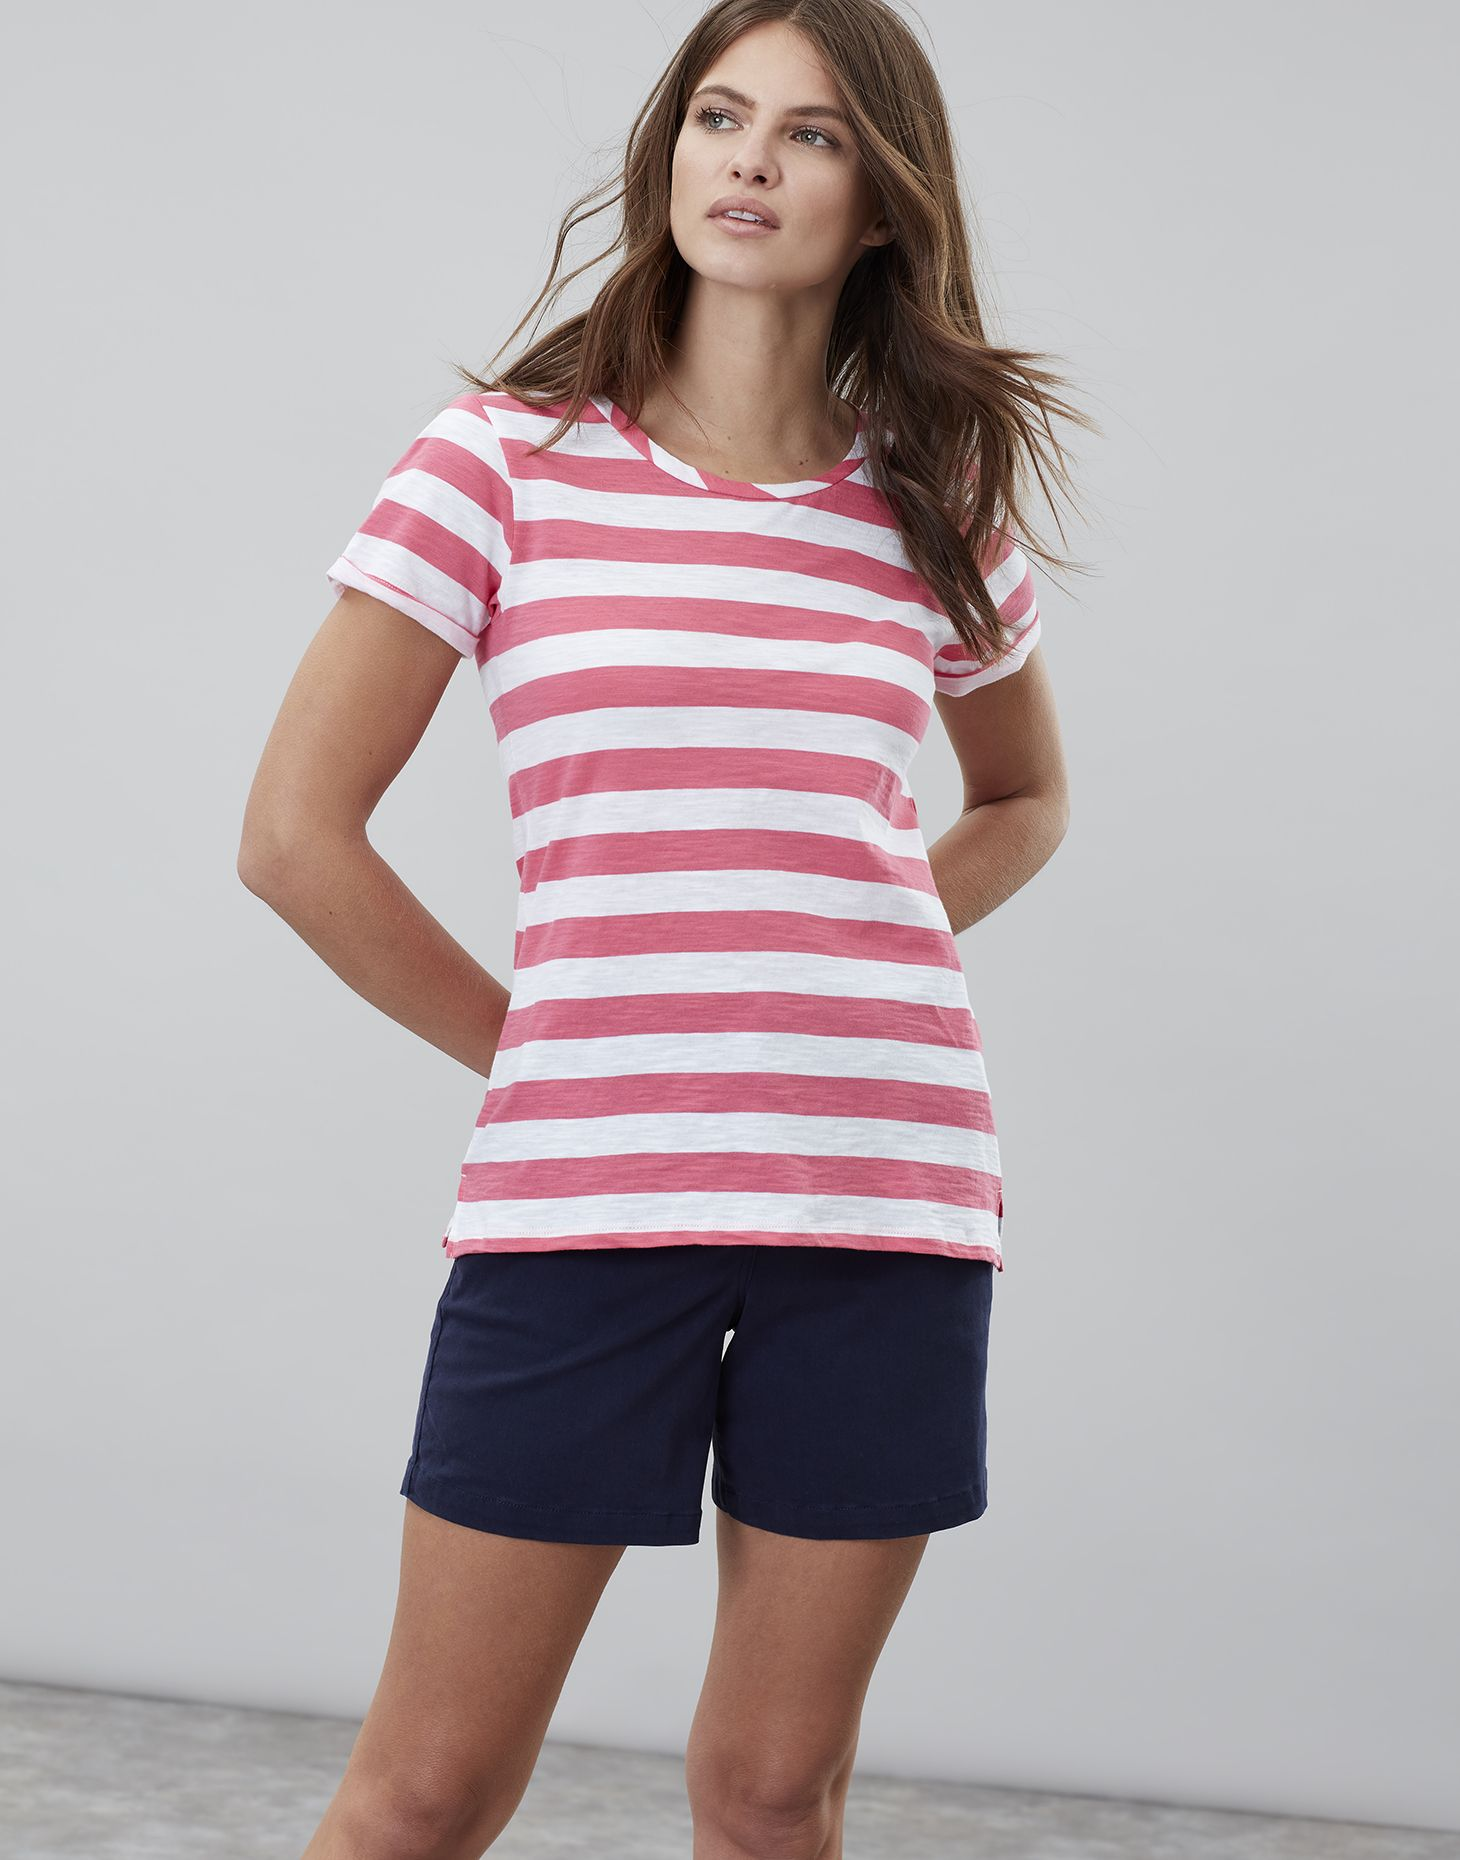 006a43df Joules Womens Nessa Stripe Lightweight Jersey T shirt in PINK WHITE STRIPE